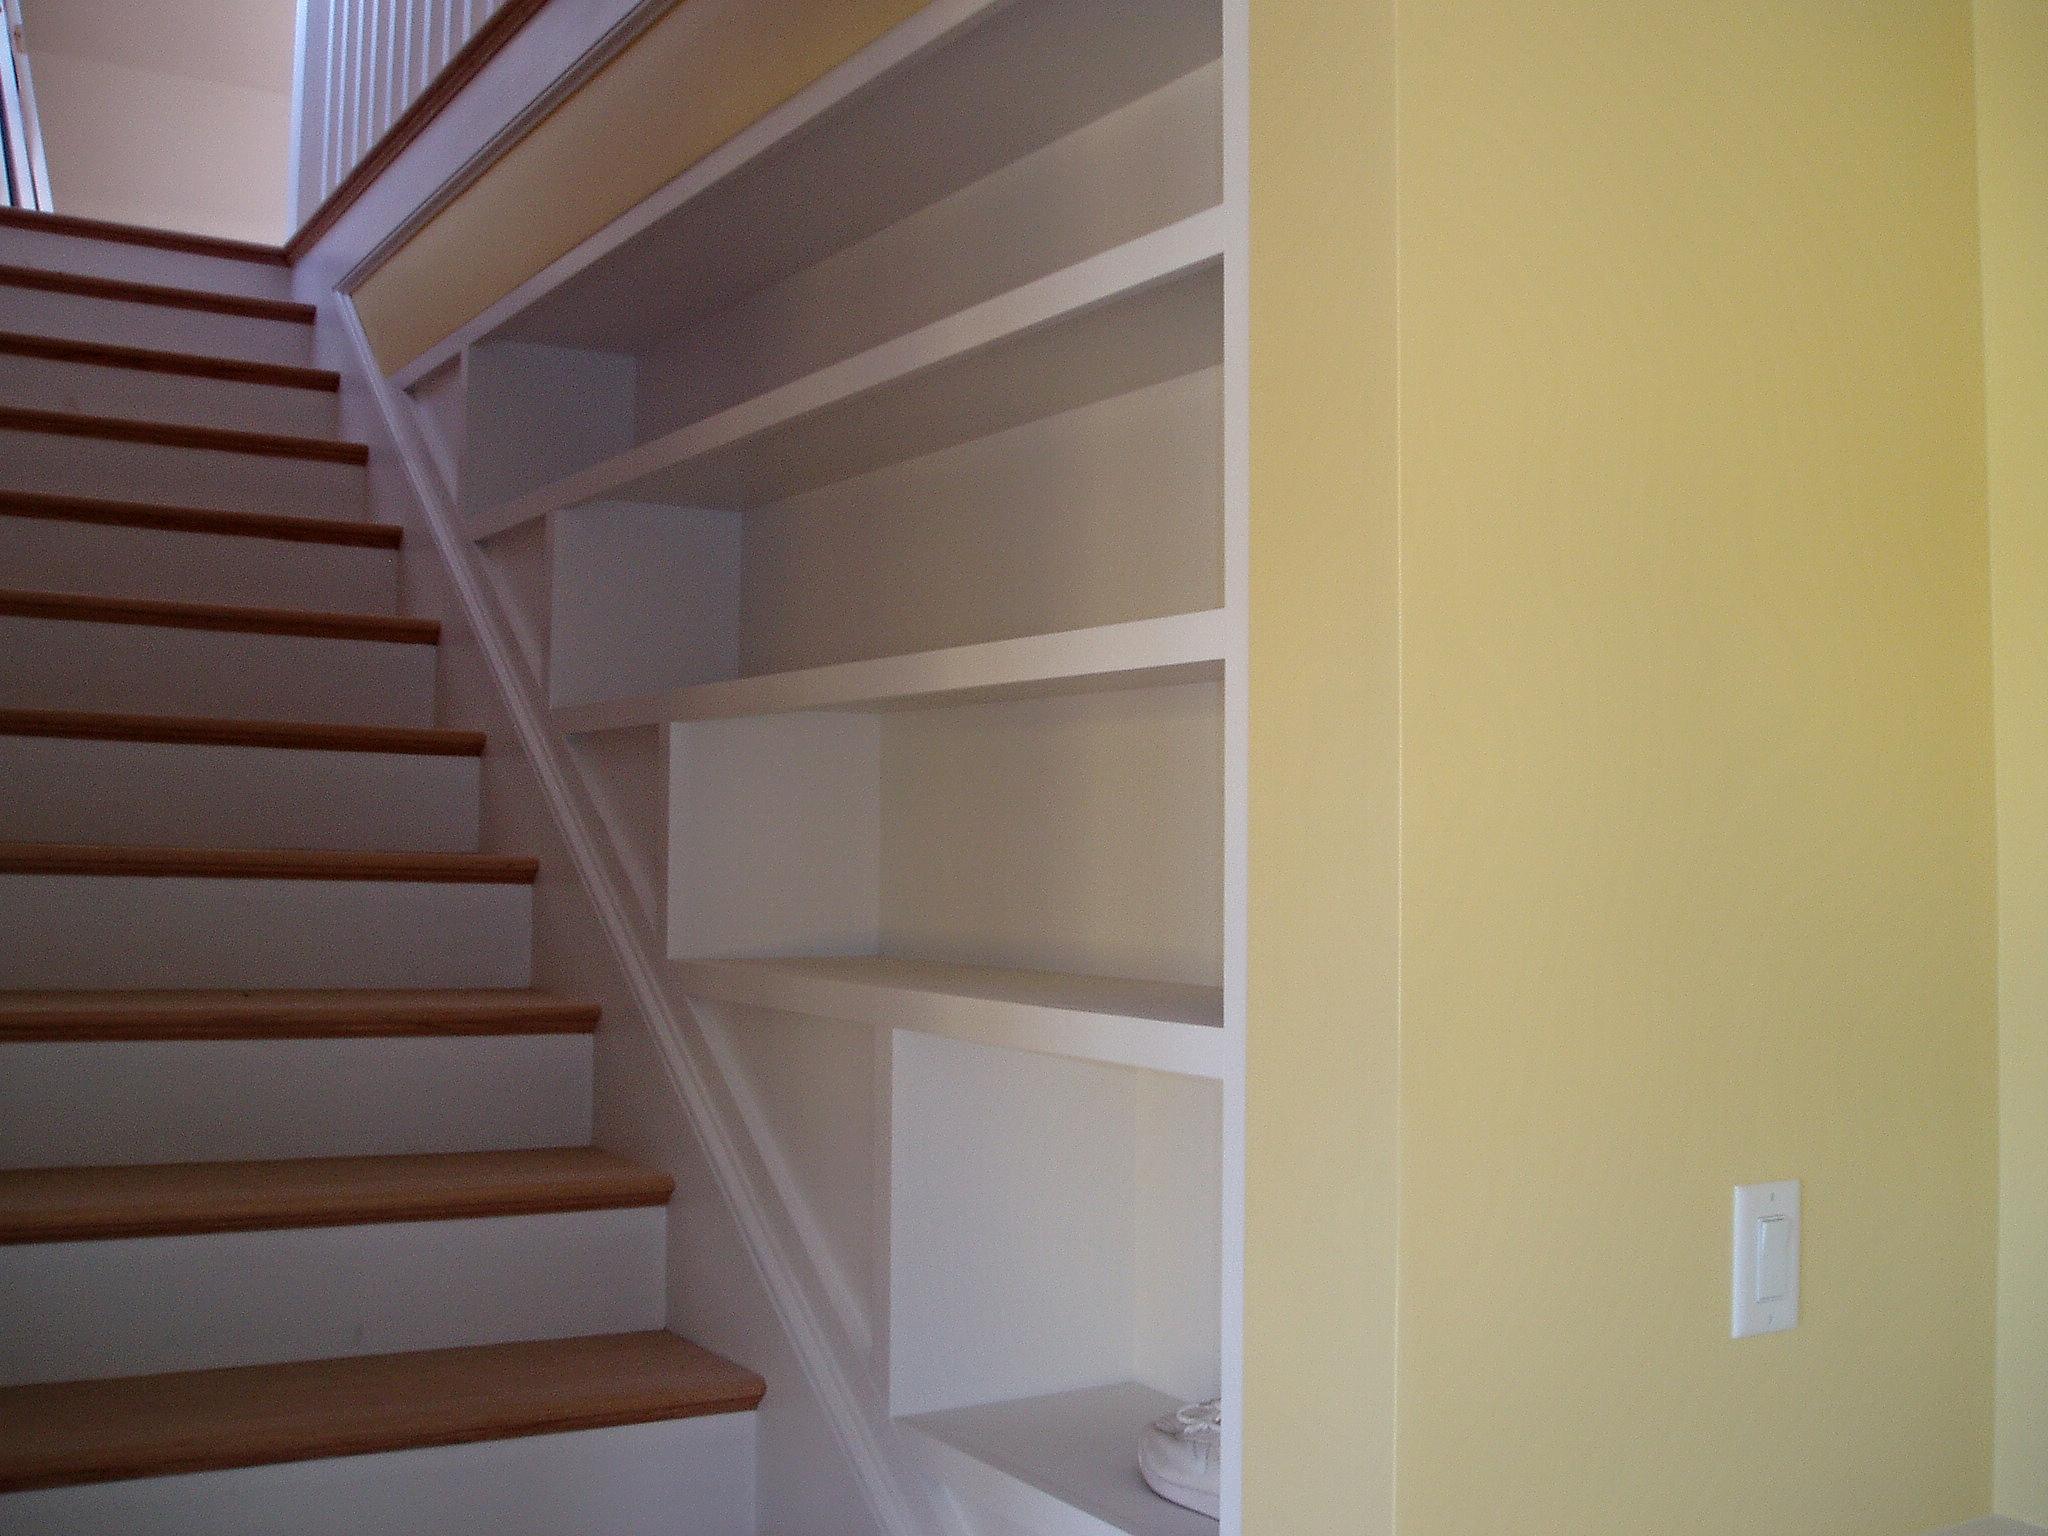 mcnally shelf stairs.JPG